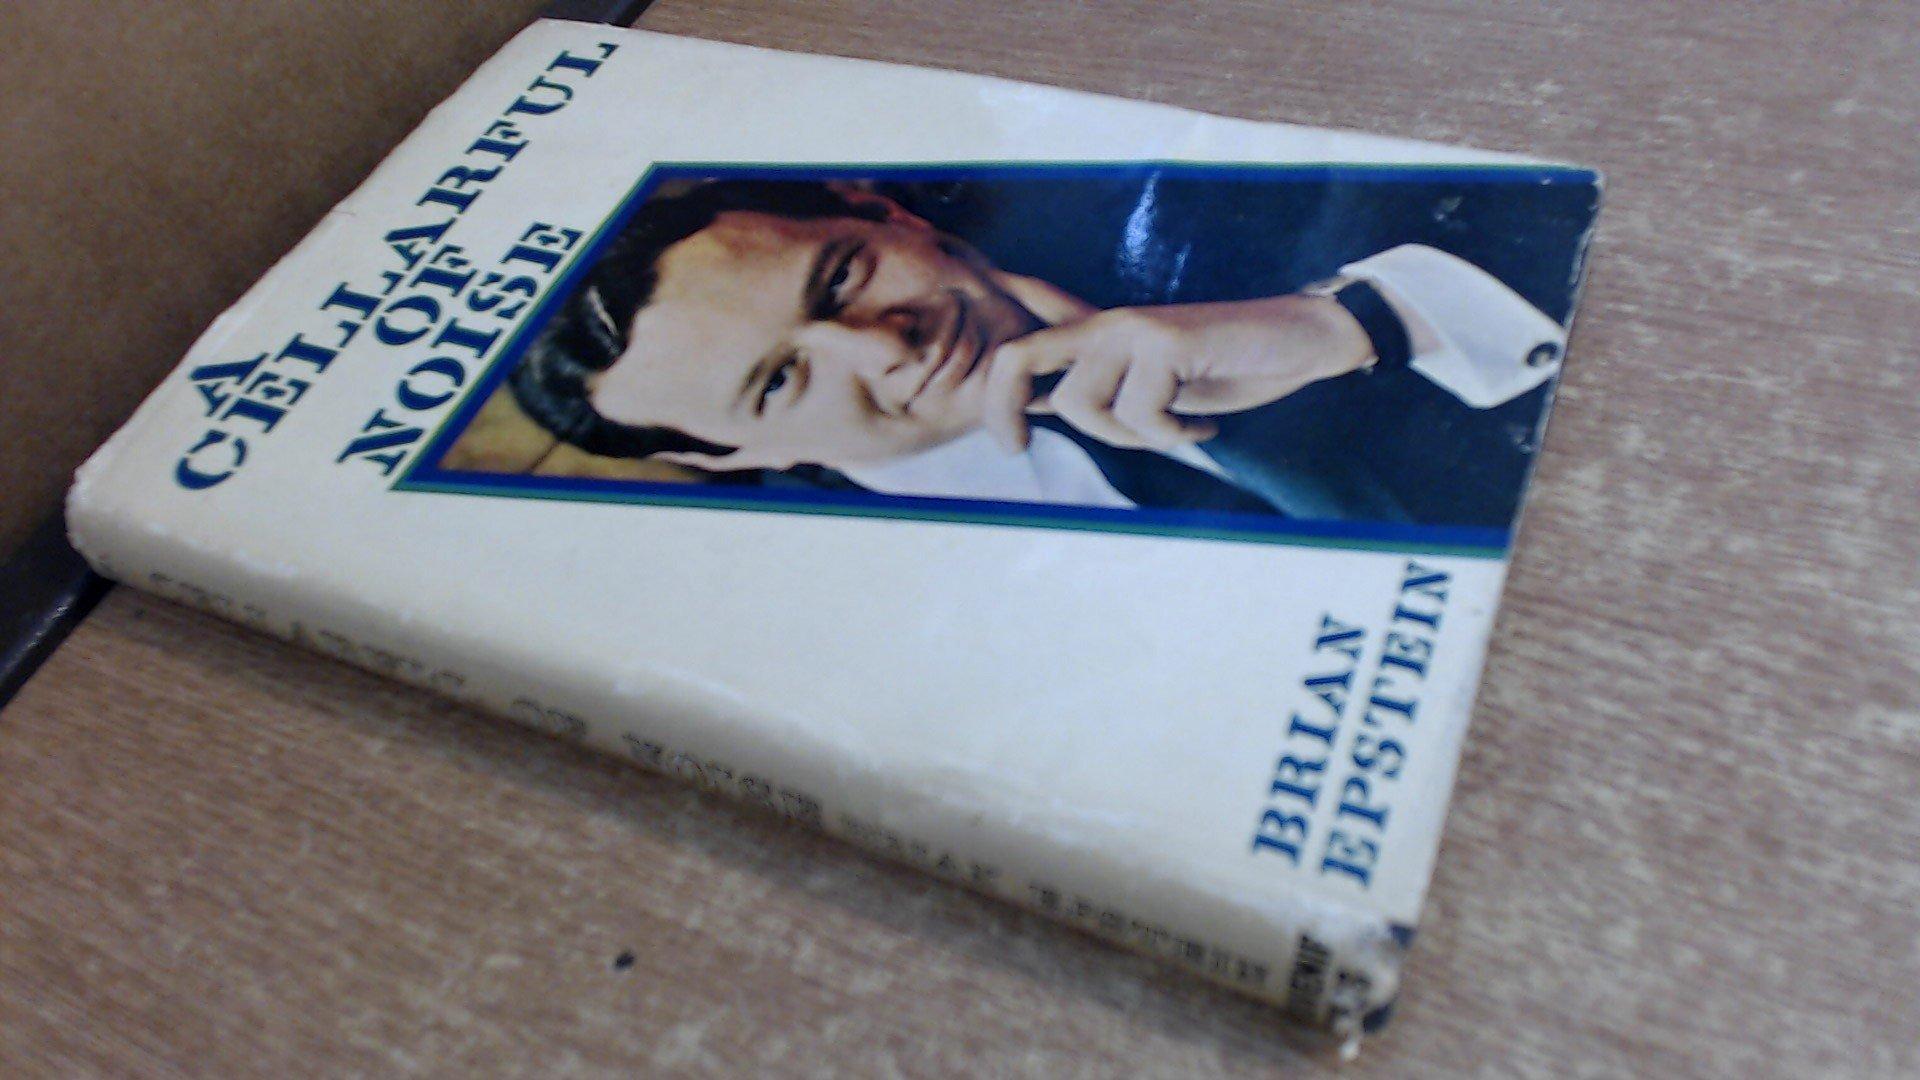 A cellarful of noise: Amazon.co.uk: Brian Epstein: Books